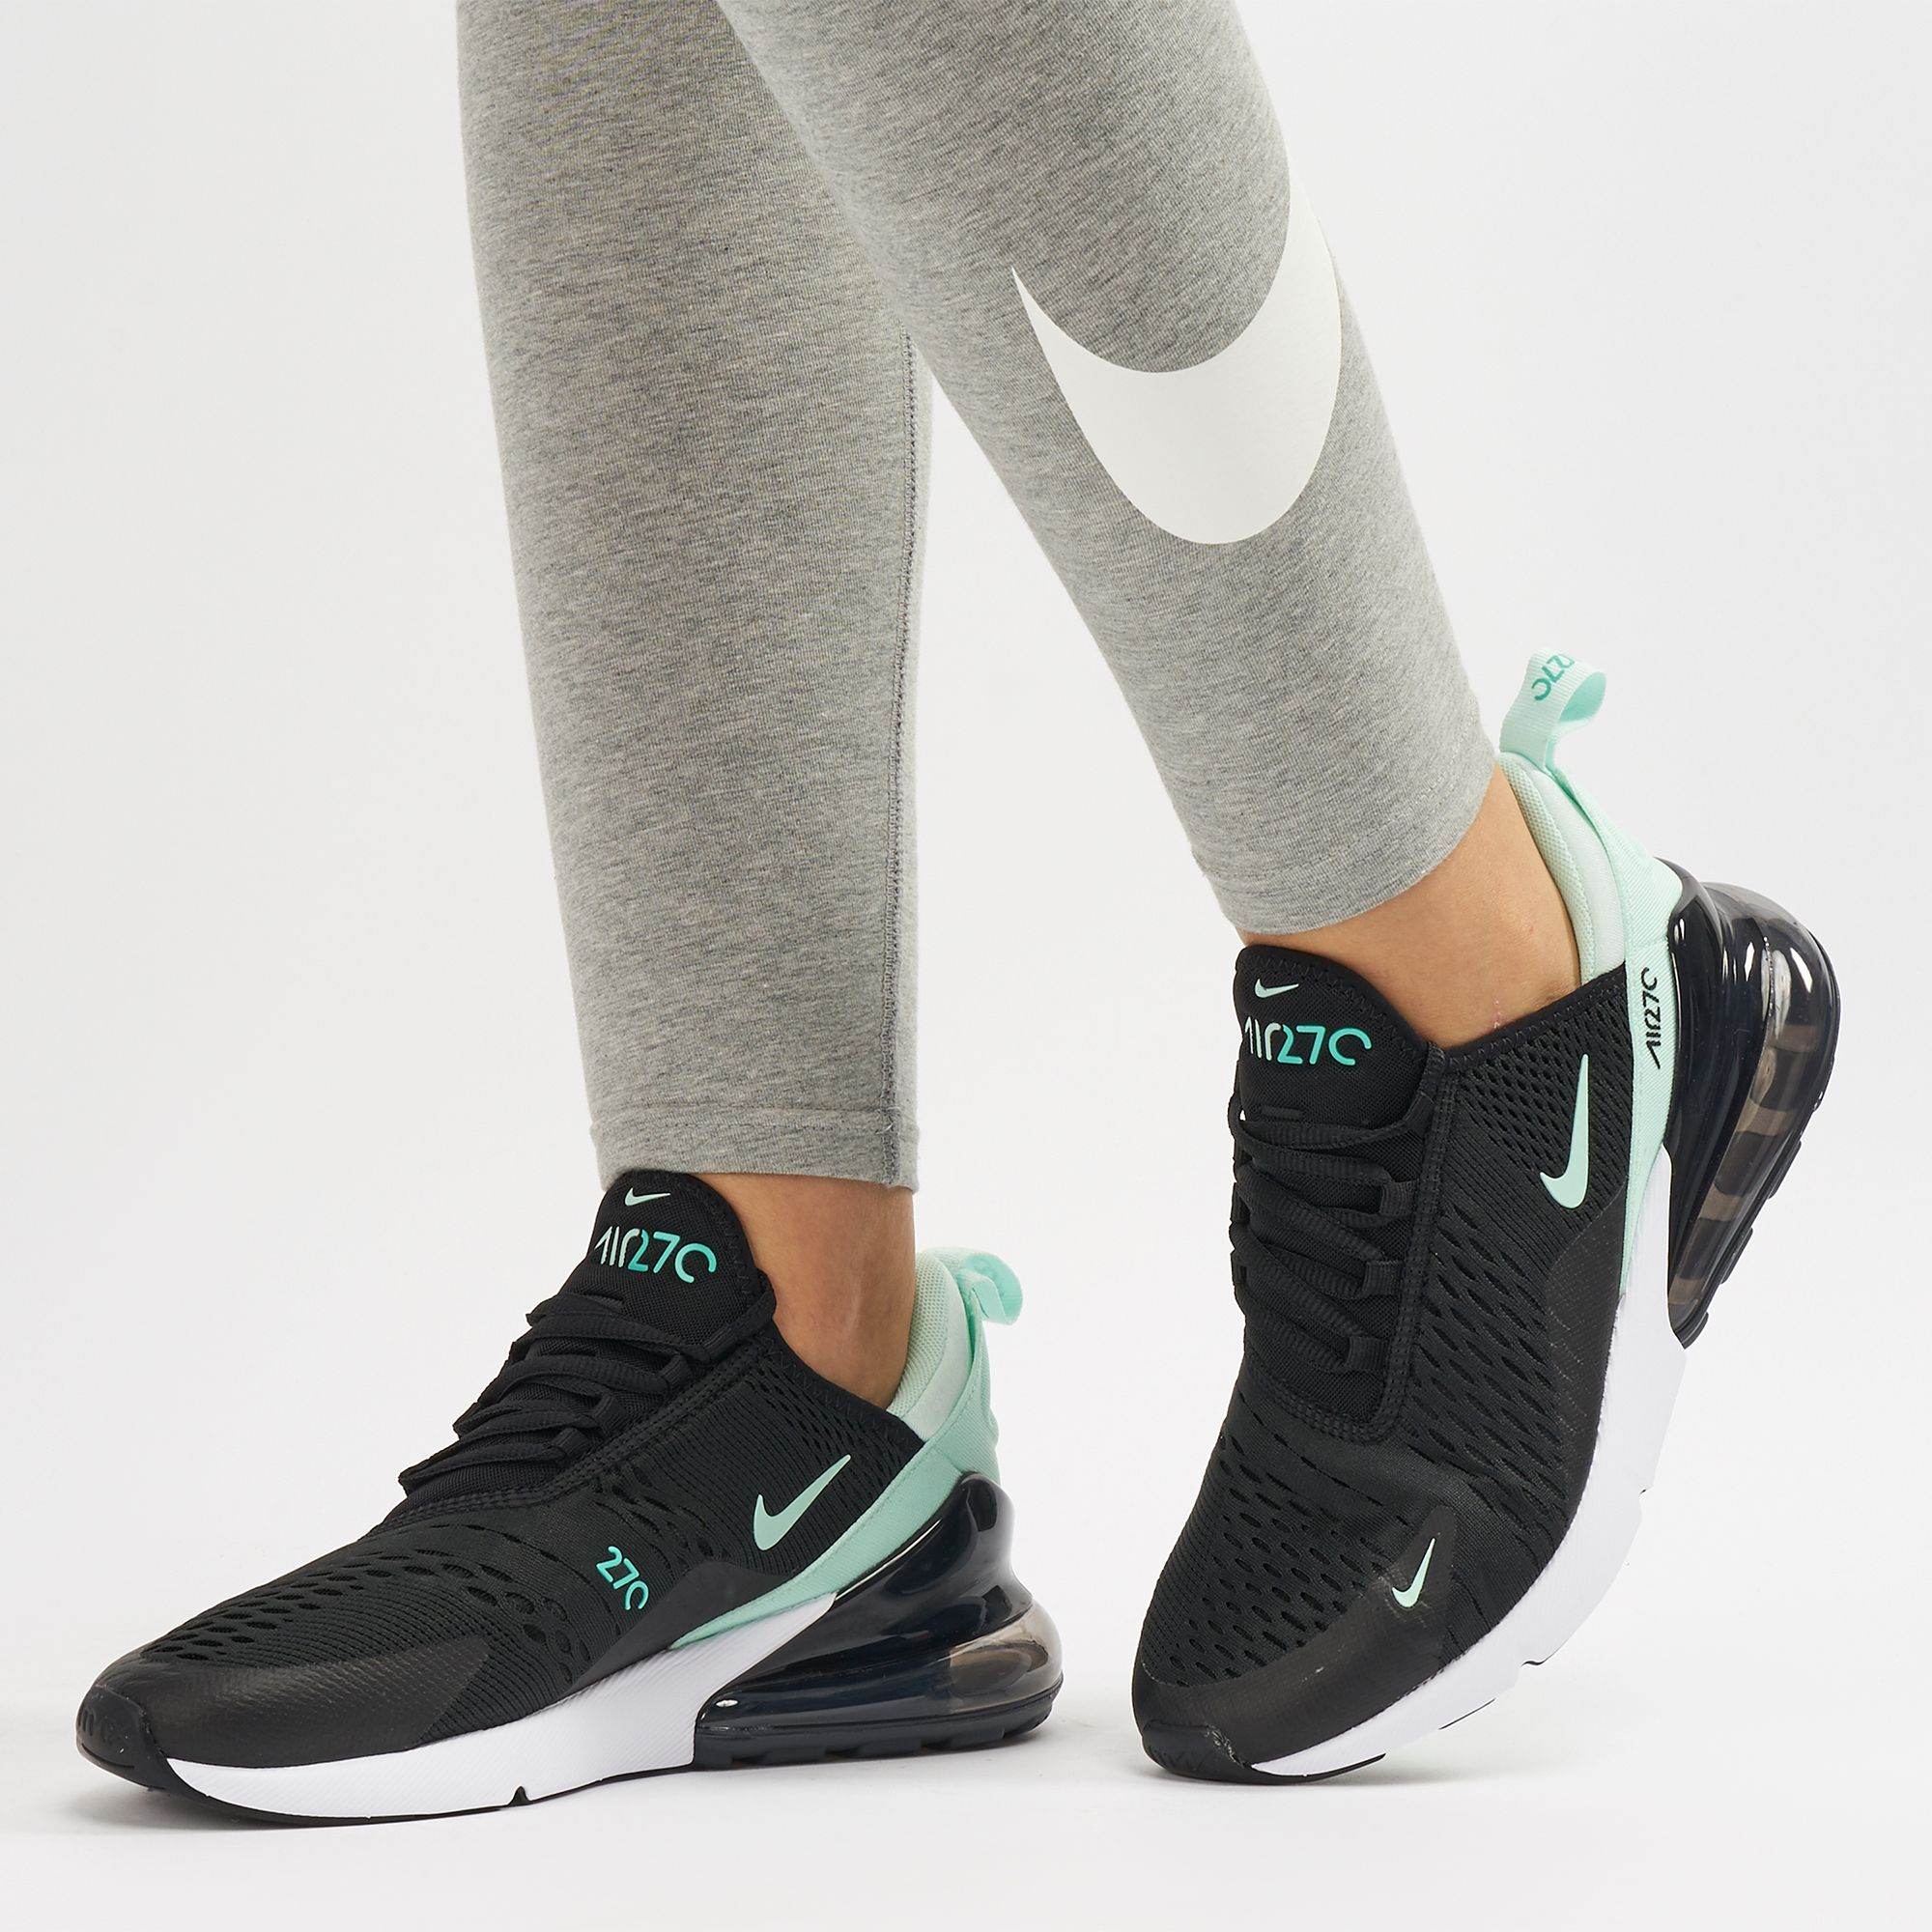 f3a973461 حذاء اير ماكس 270 من نايك   احذية سنيكرز للنساء   تخفيضات الاحذية ...